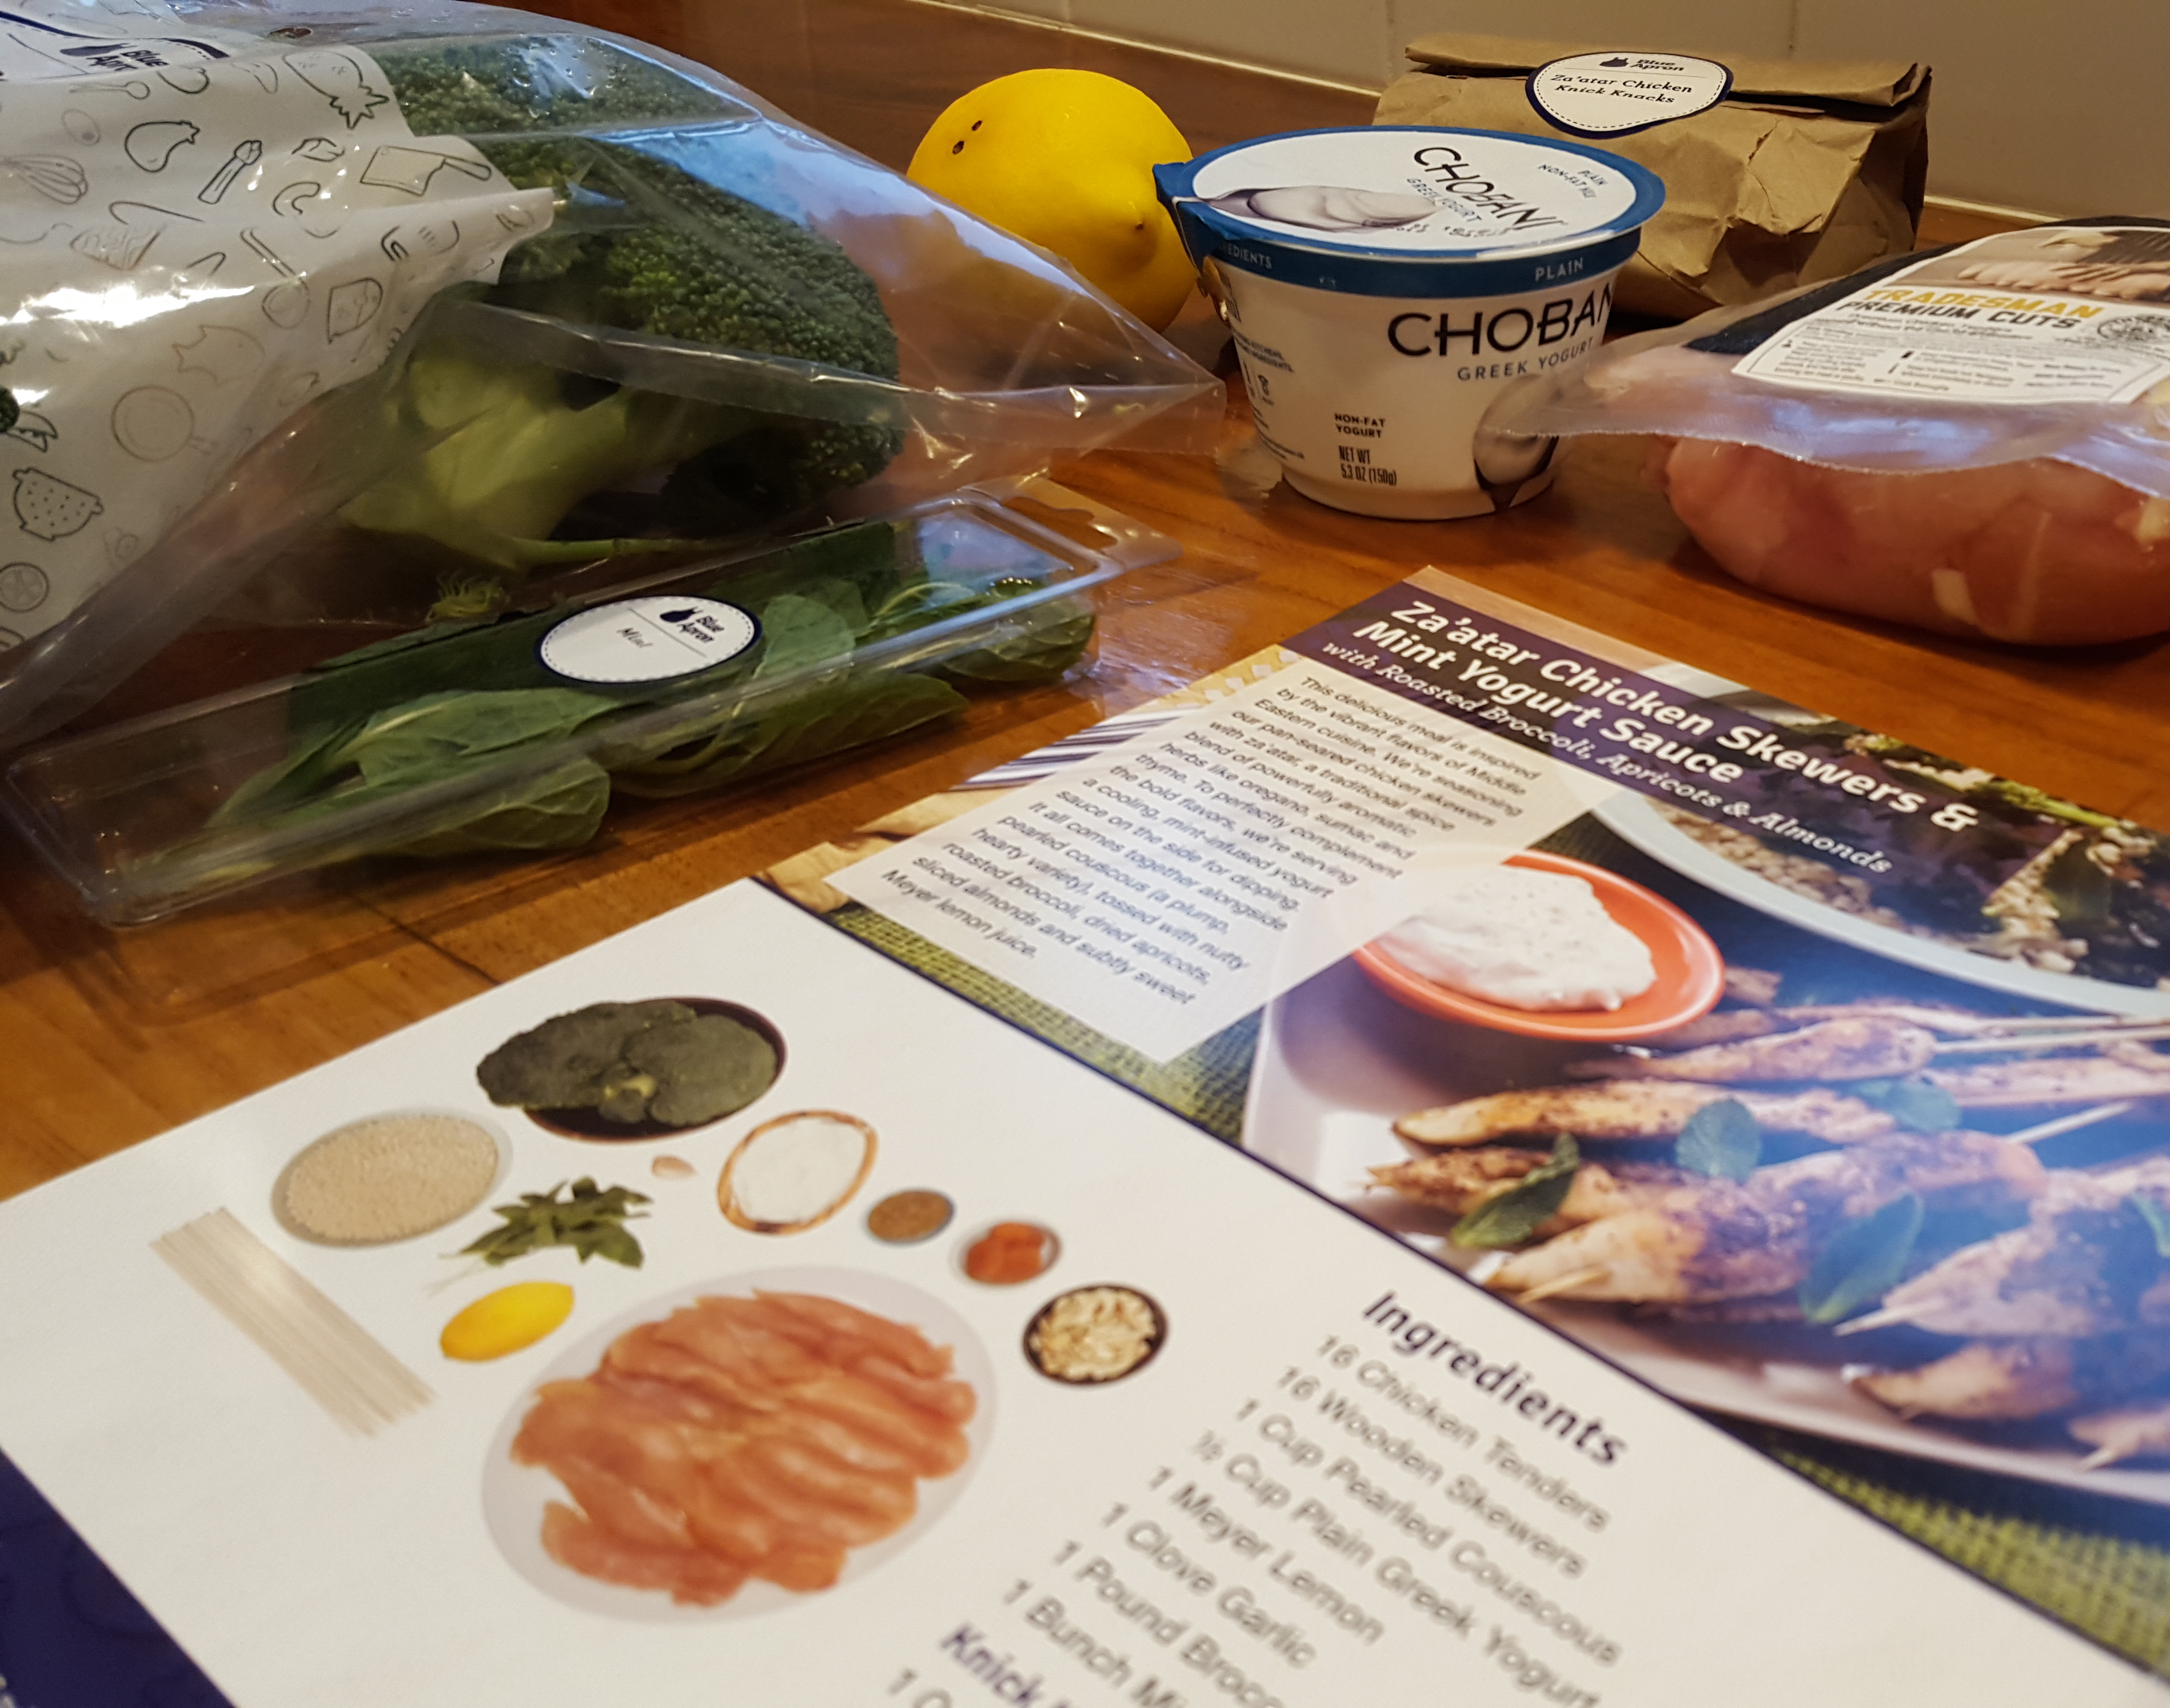 Blue apron yogurt sauce - Blue Apron Za Atar 2